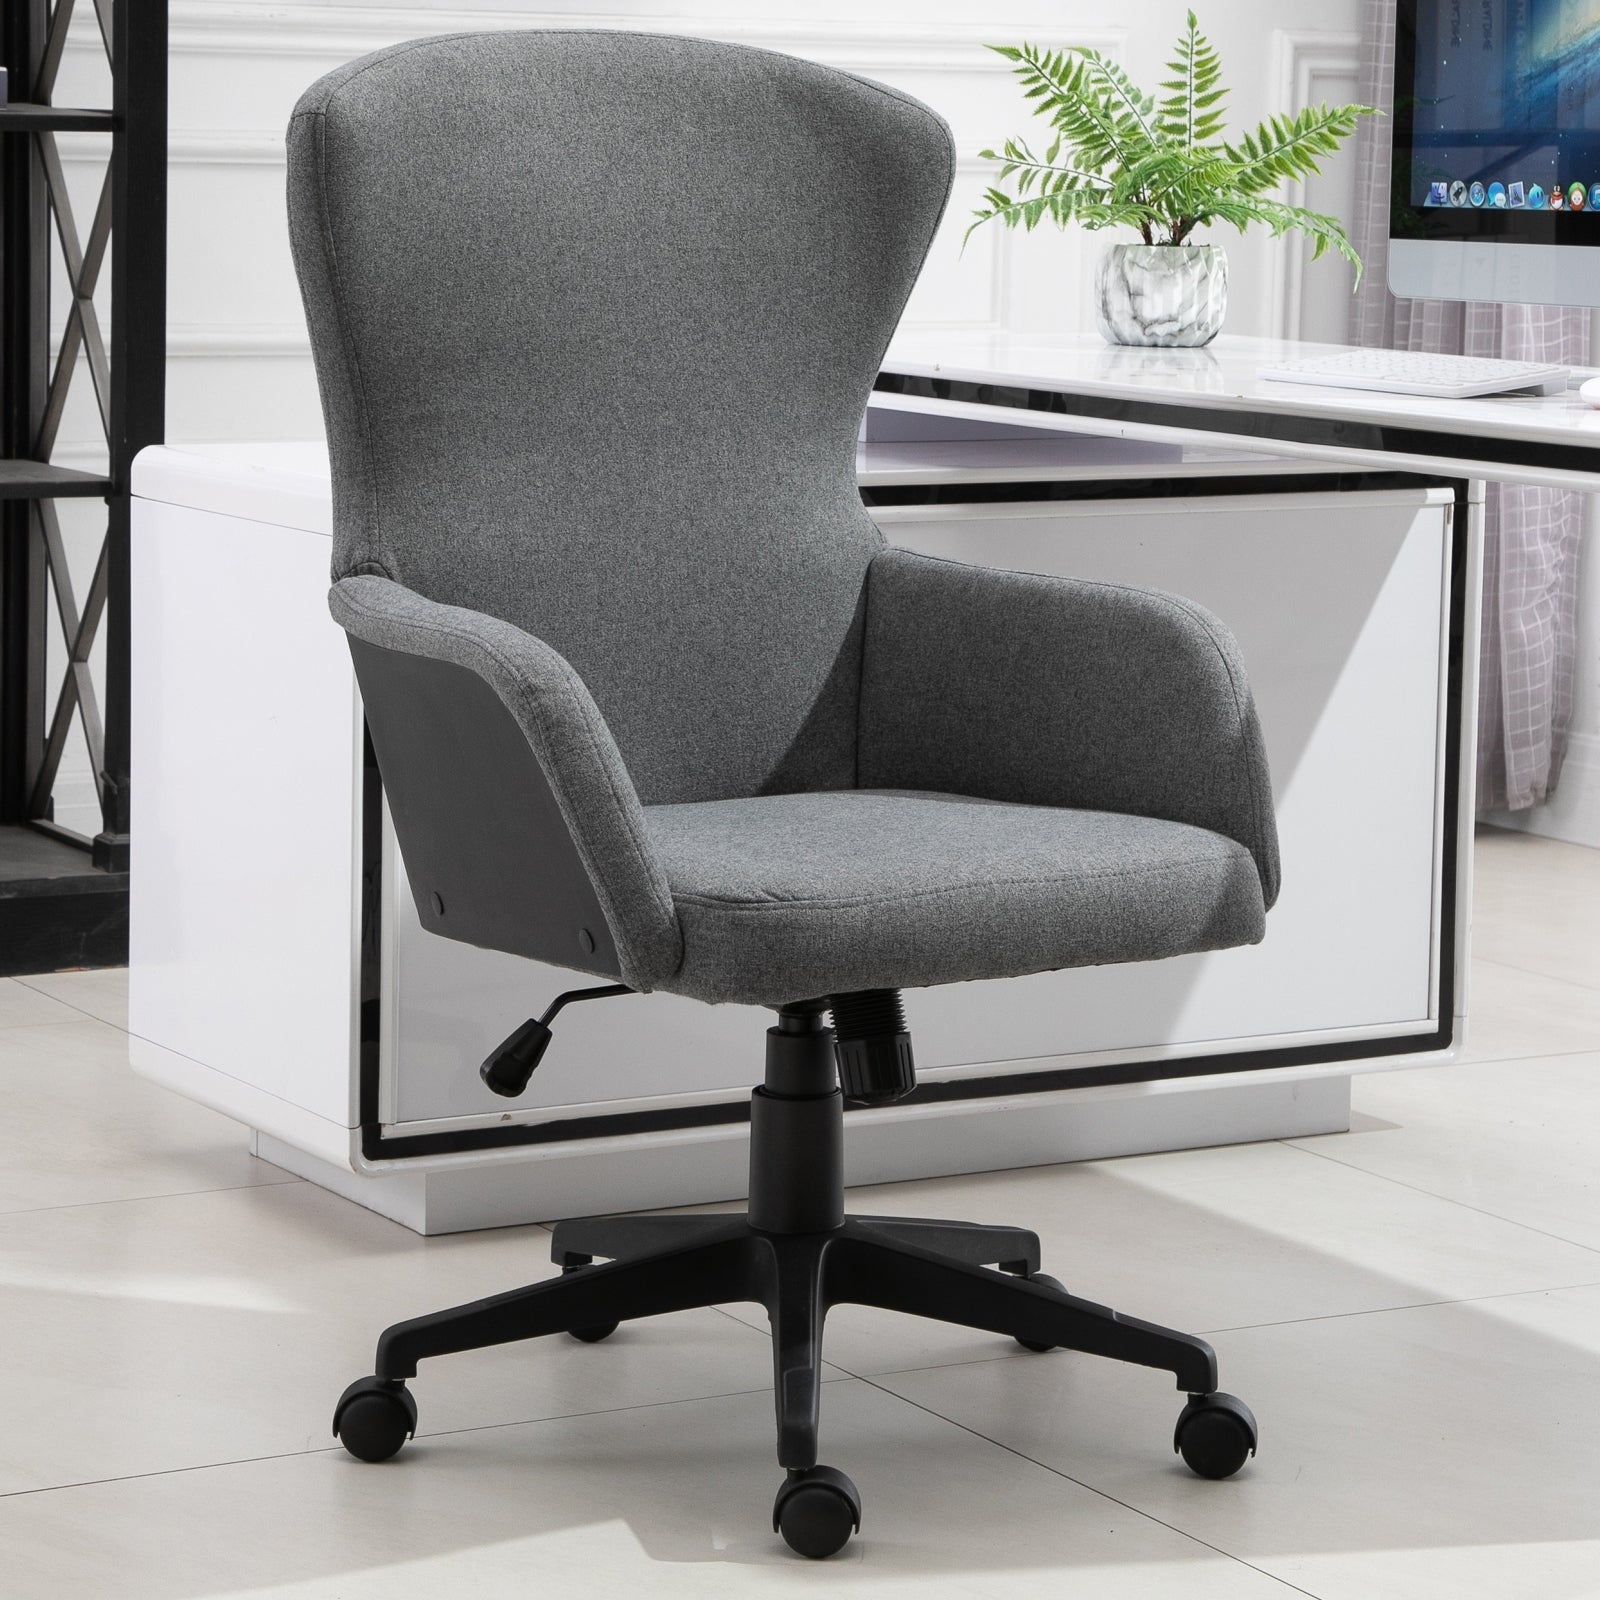 Vinsetto Ergonomic Rolling Office Desk & Computer Chair with 47 Castor  Wheels & Easy Adjustable Height/Tilt